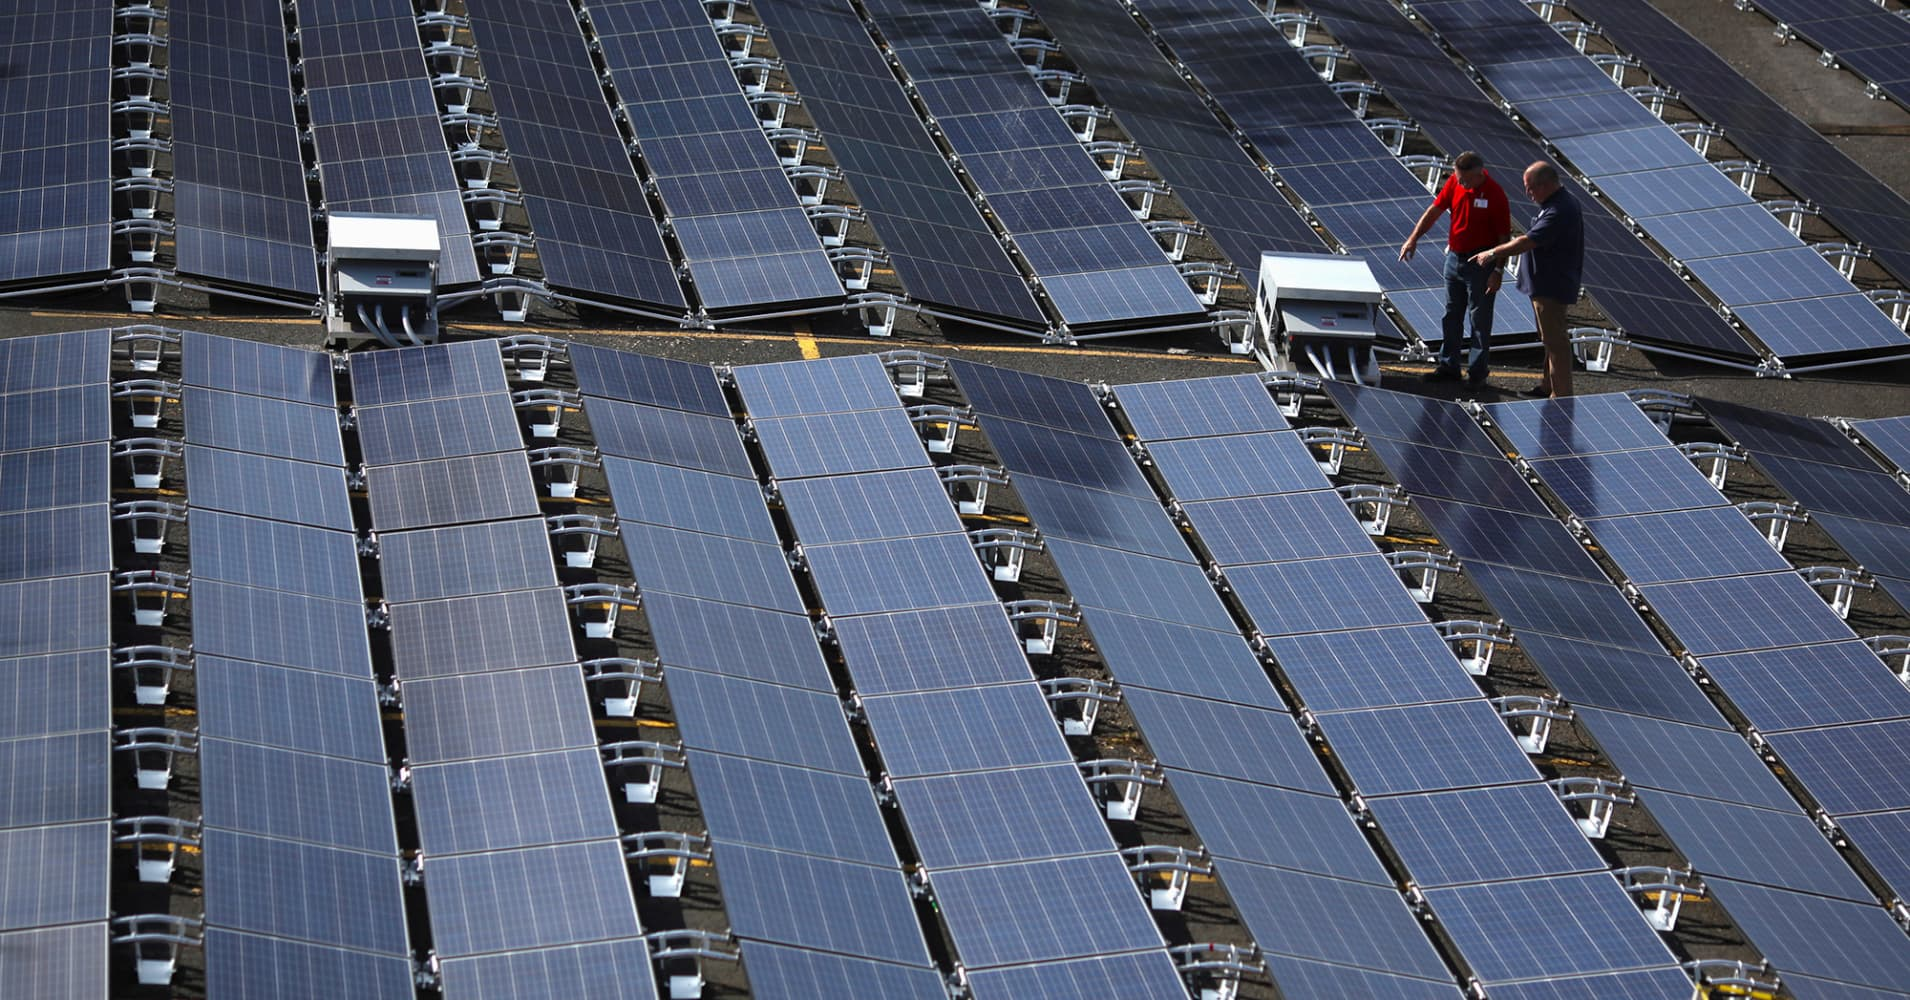 Tesla is preparing to close a dozen solar facilities in 9 states